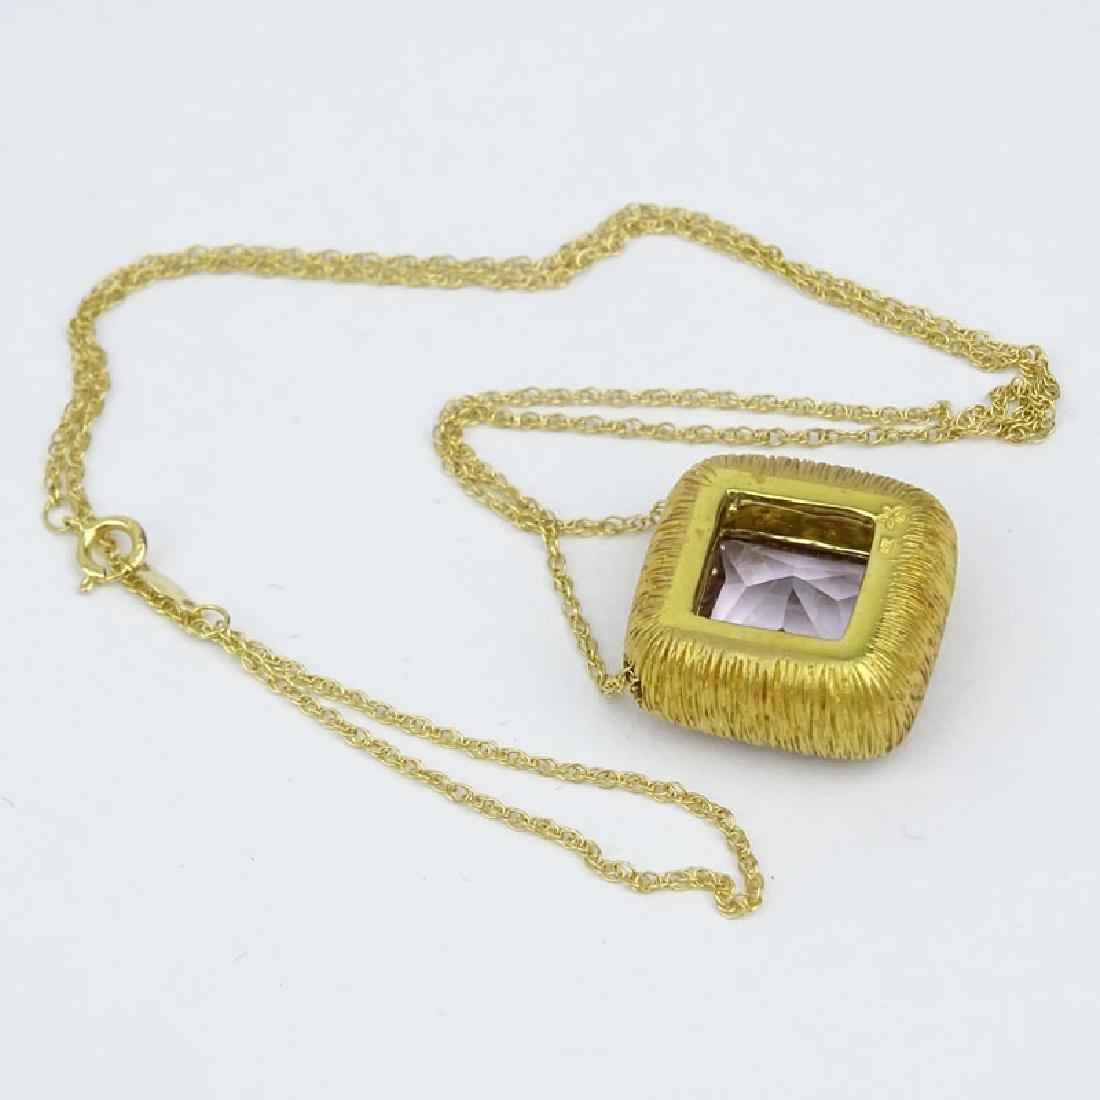 Vintage Square Cut Morganite and 18 Karat Yellow Gold - 2